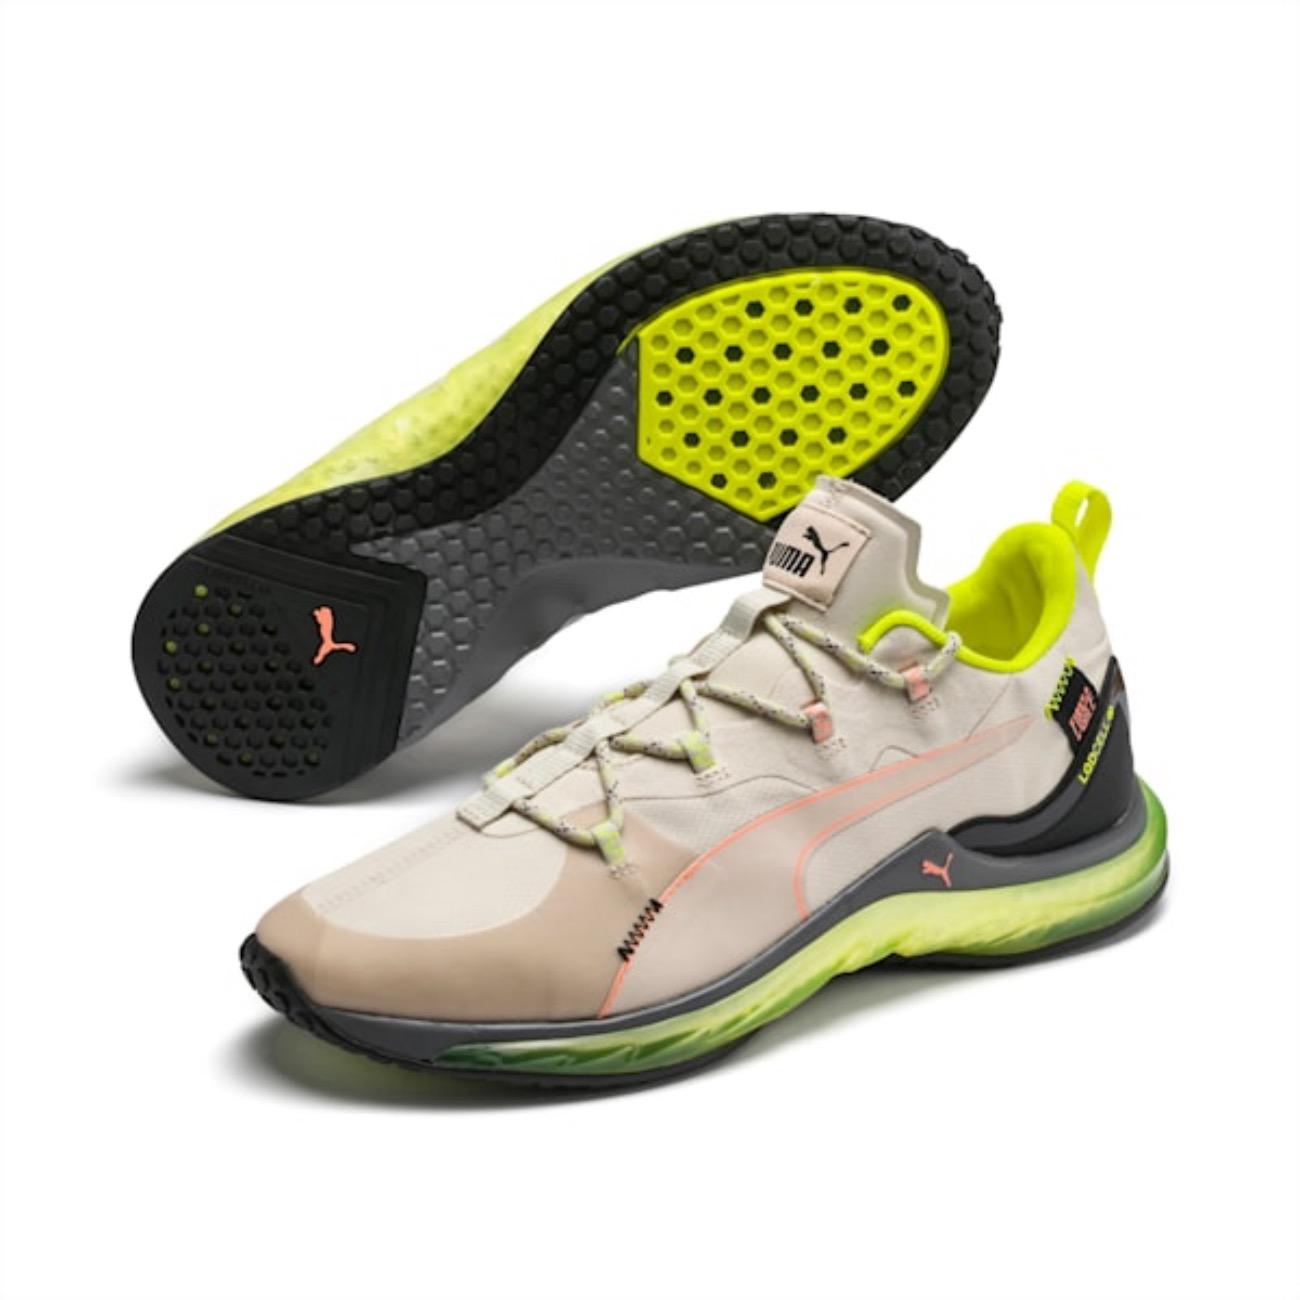 Puma LQDCELL Hydra FM First Mile Laufschuhe Sneaker Recycelt